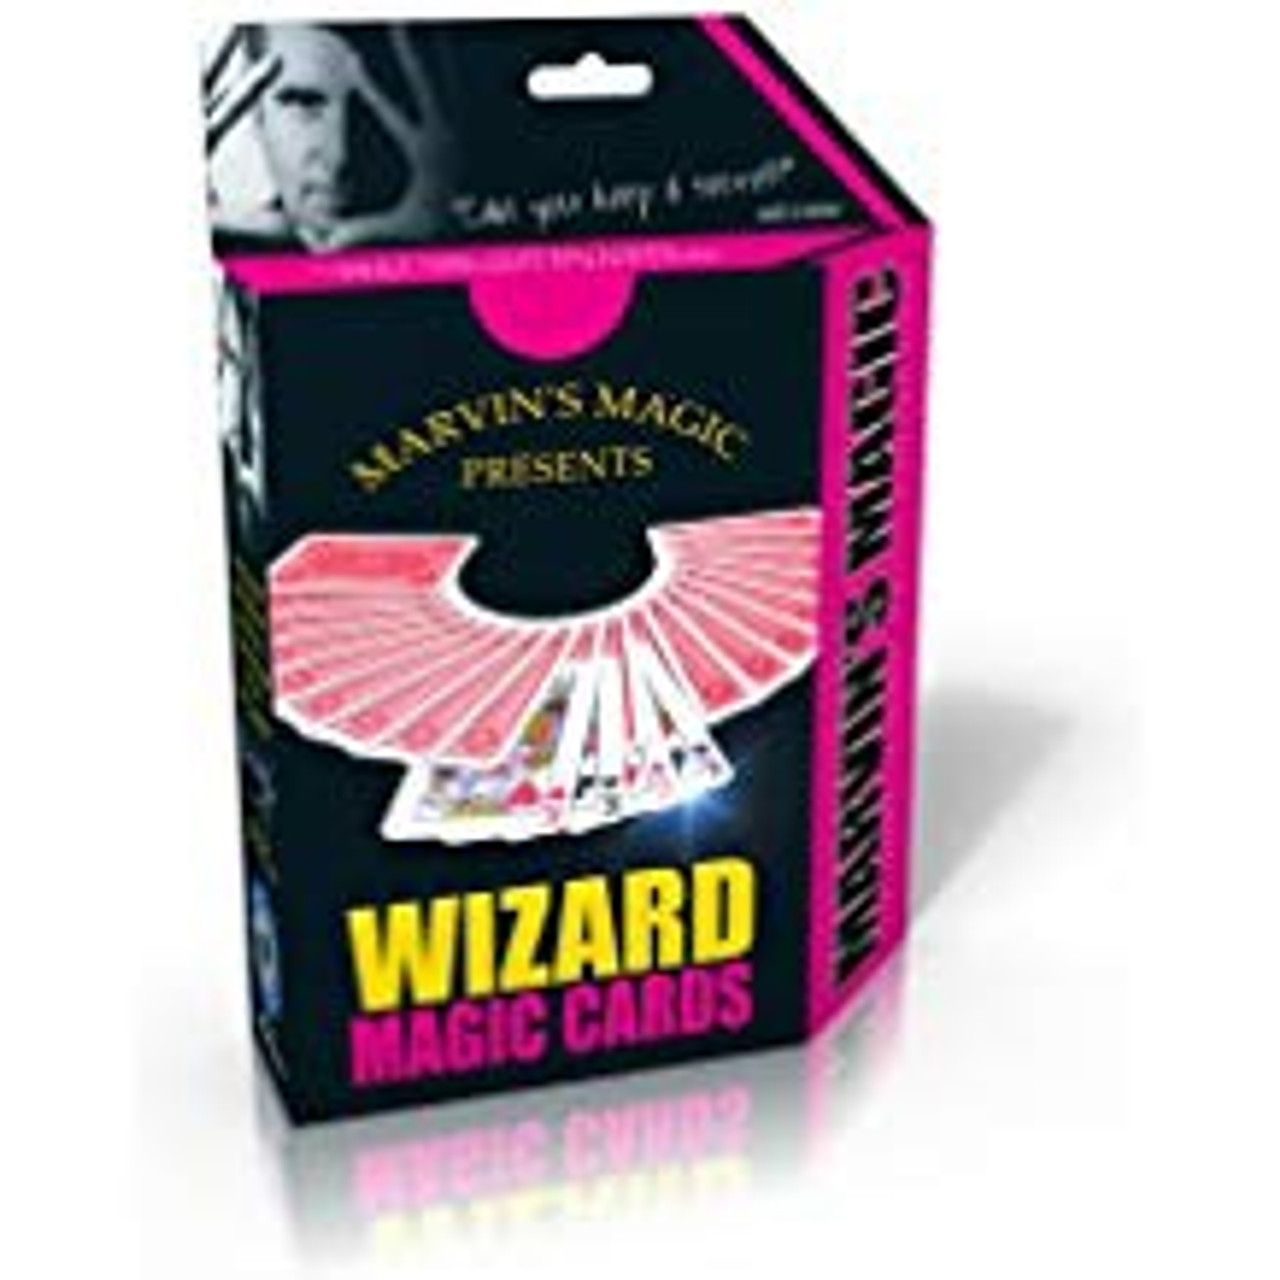 MARVIN'S MAGIC WIZARD MAGIC CARDS